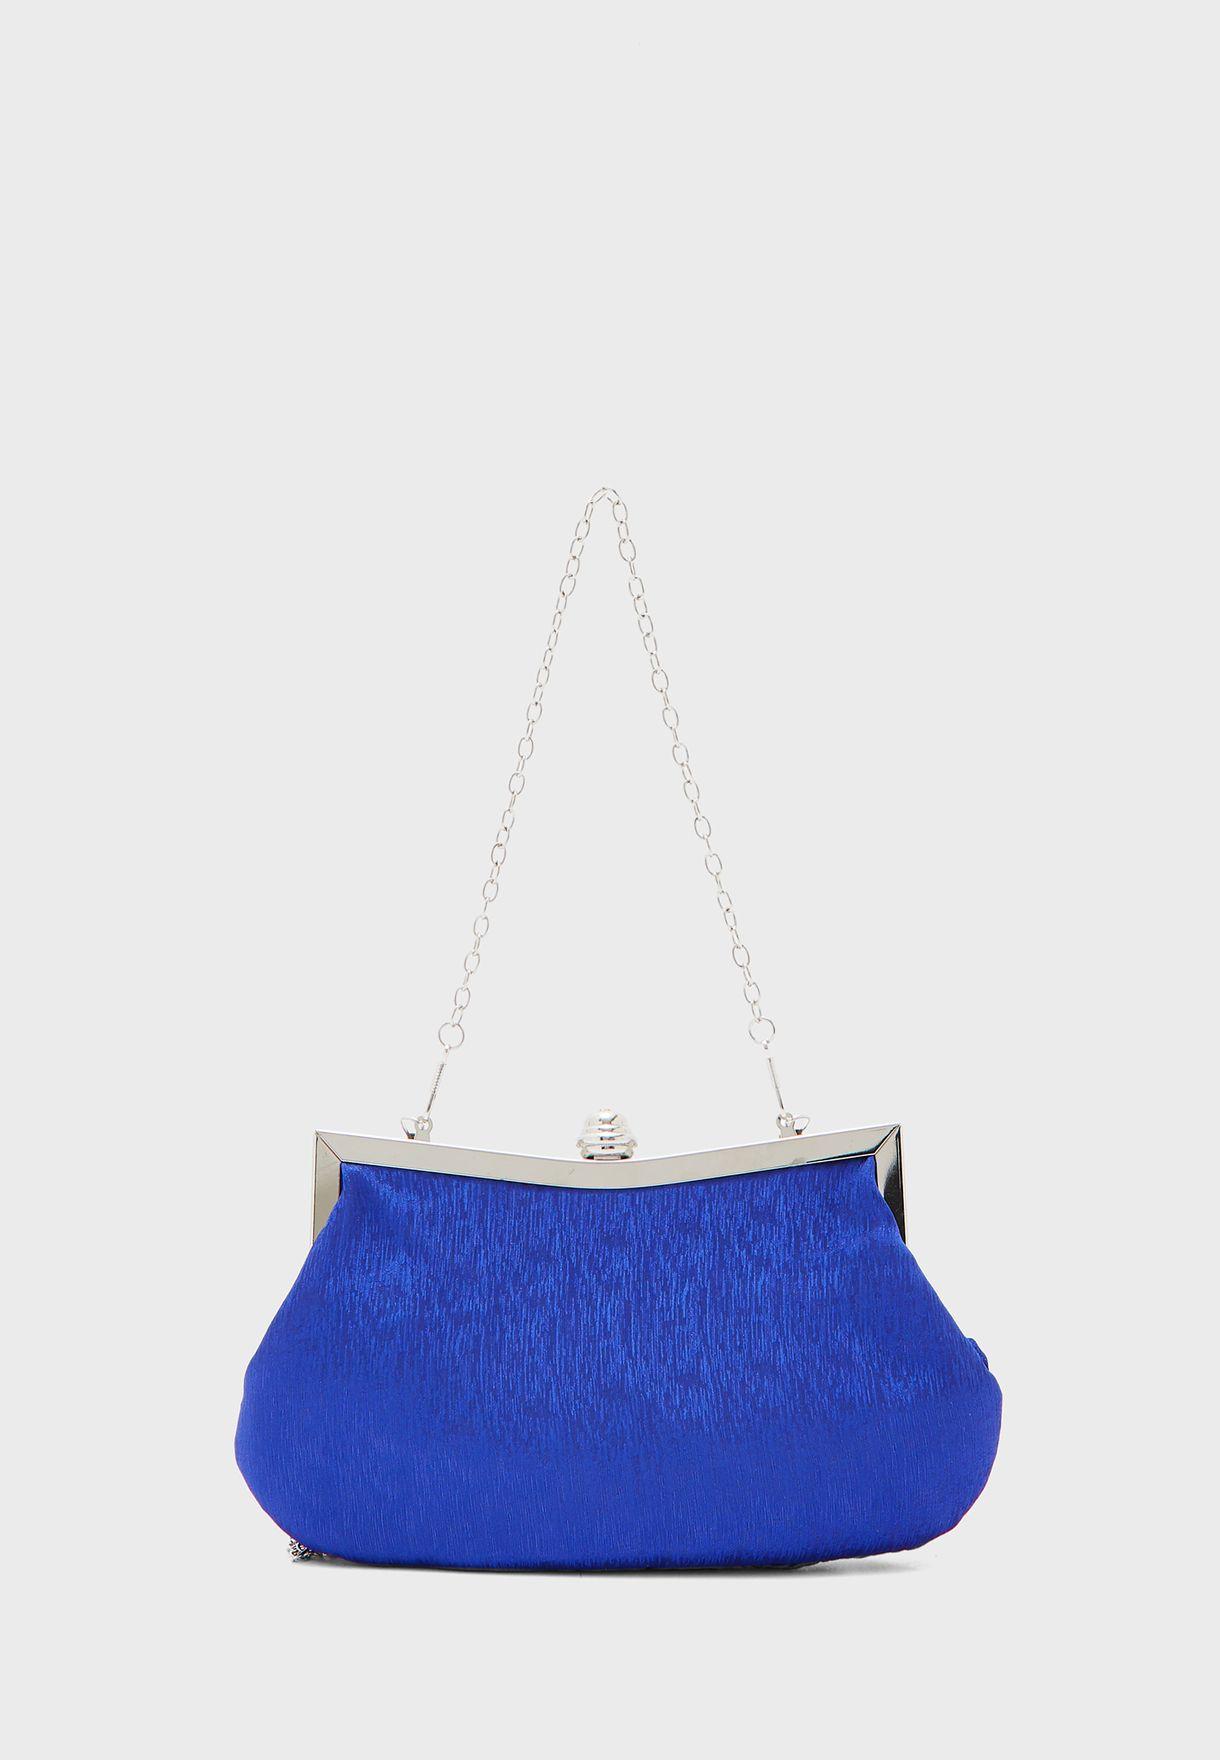 Woven Jewelled Clutch Bag